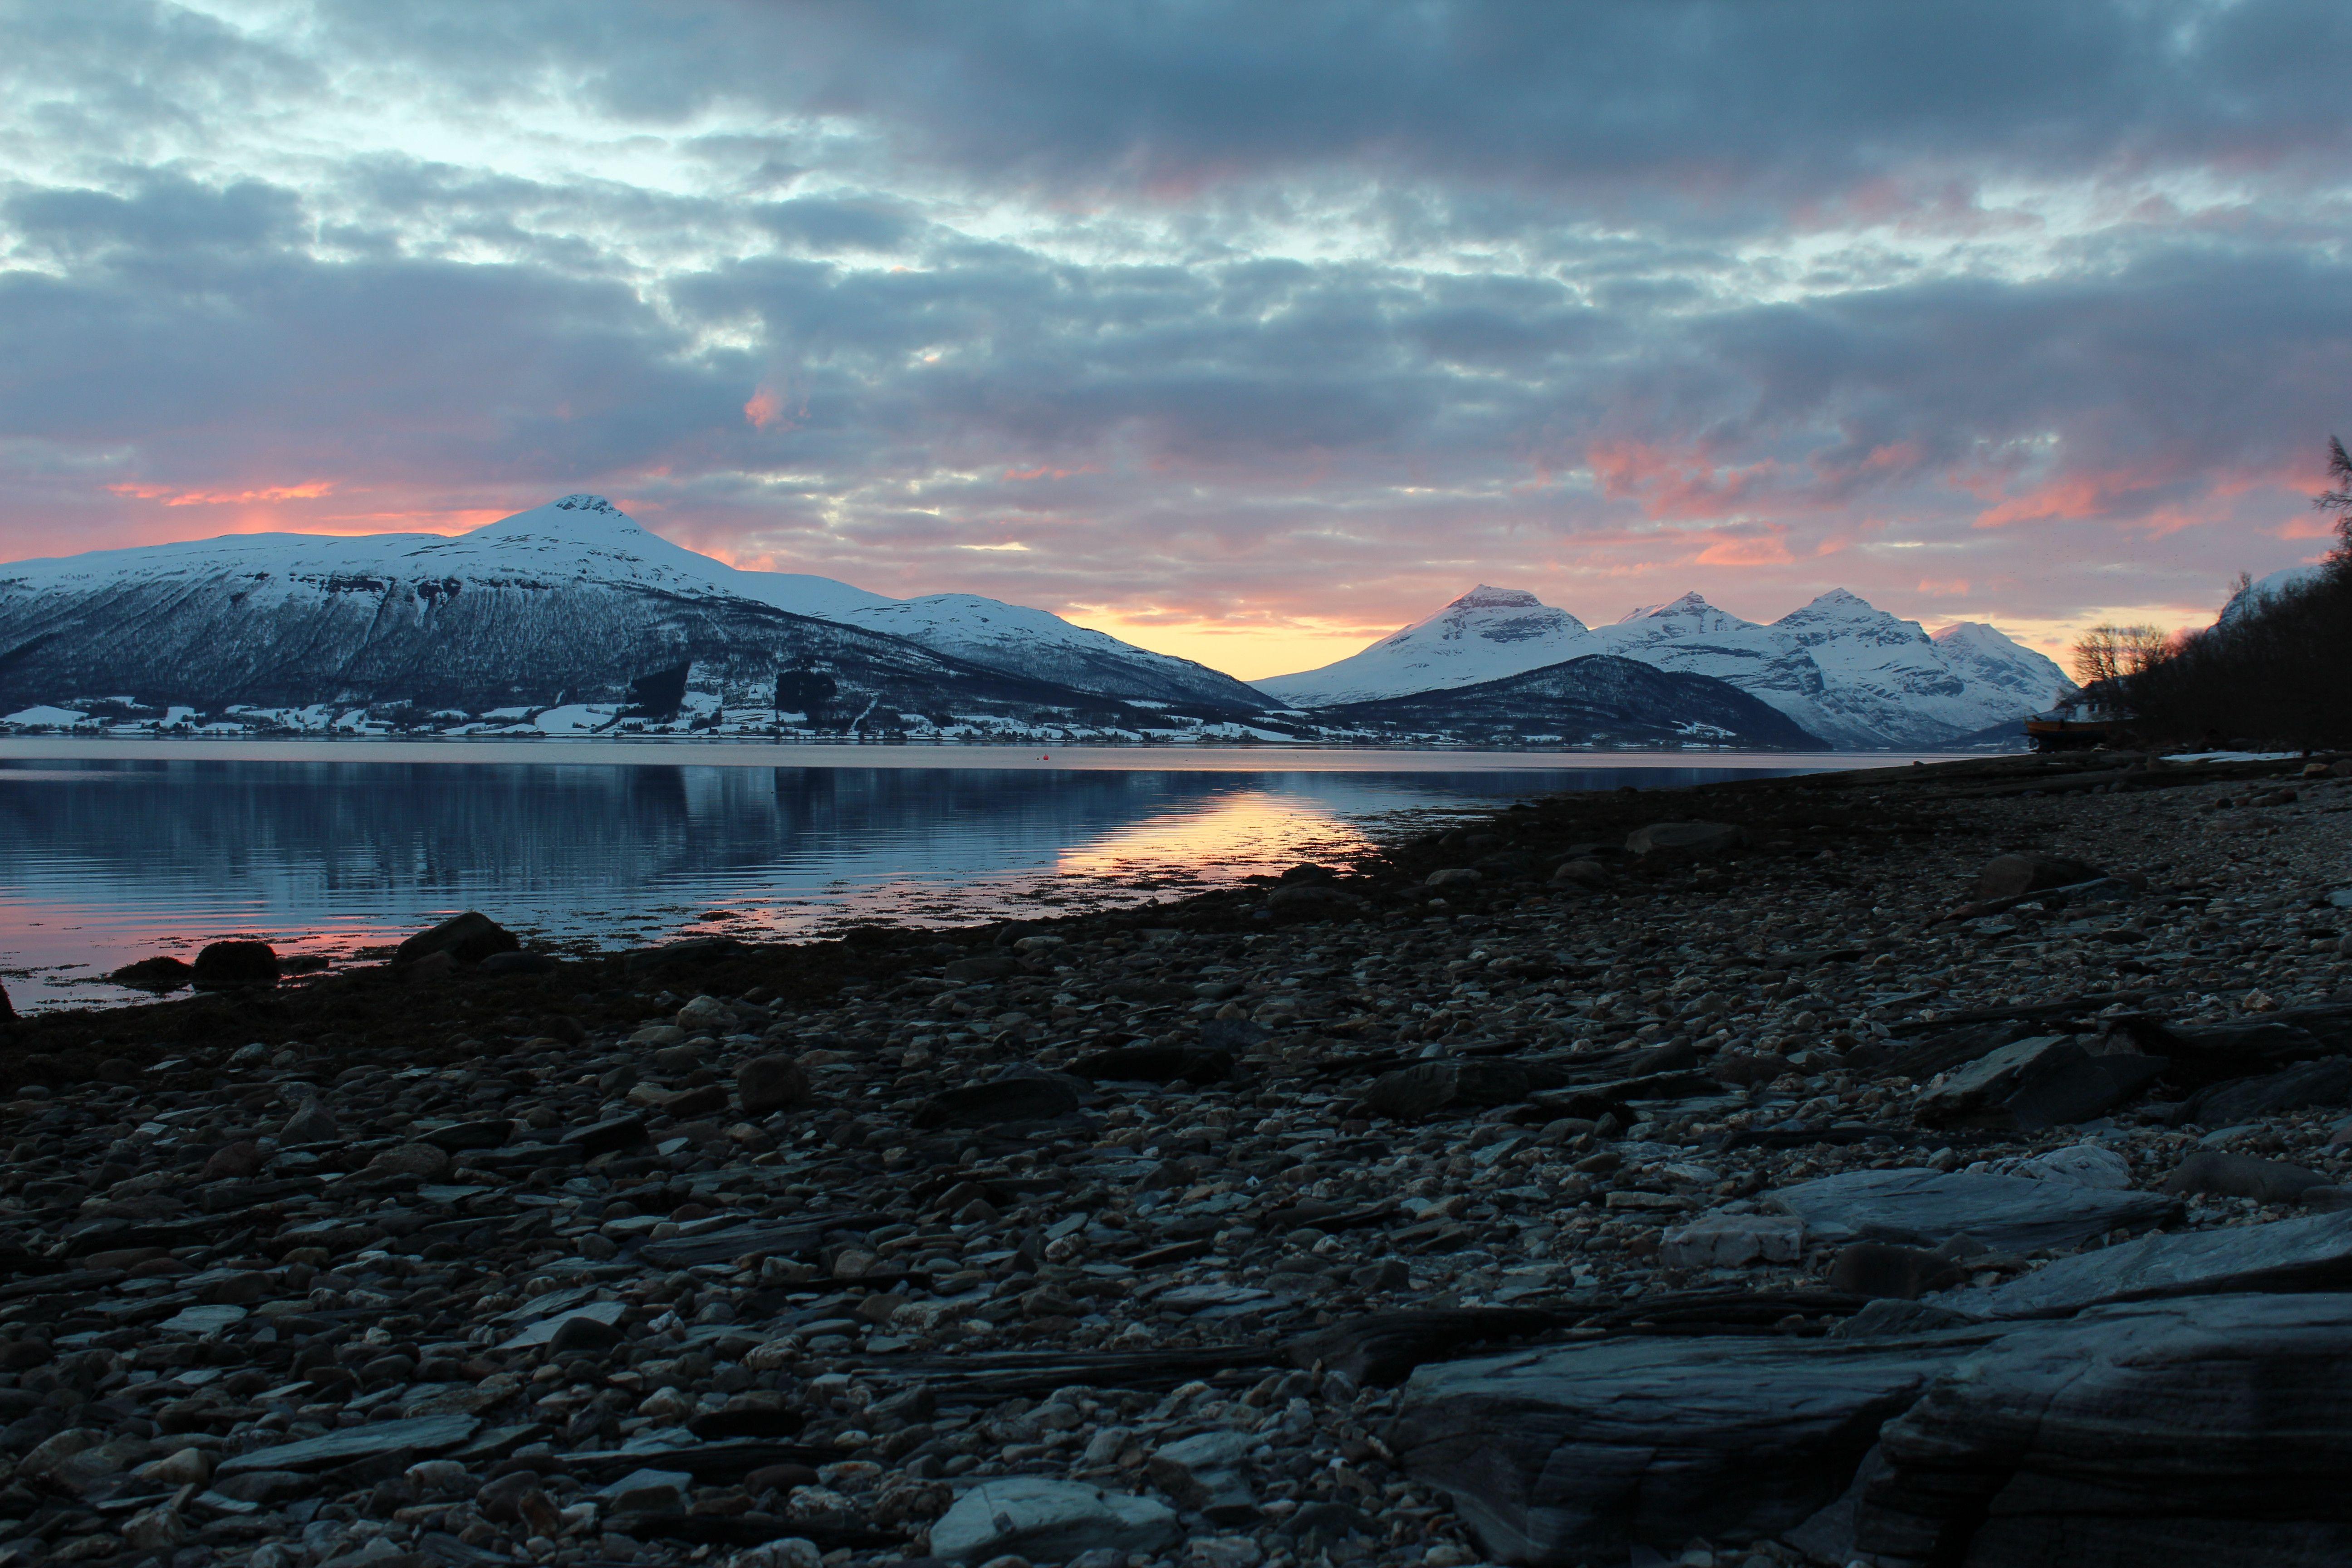 Balsfjord Norway [51843456] [OC] #reddit